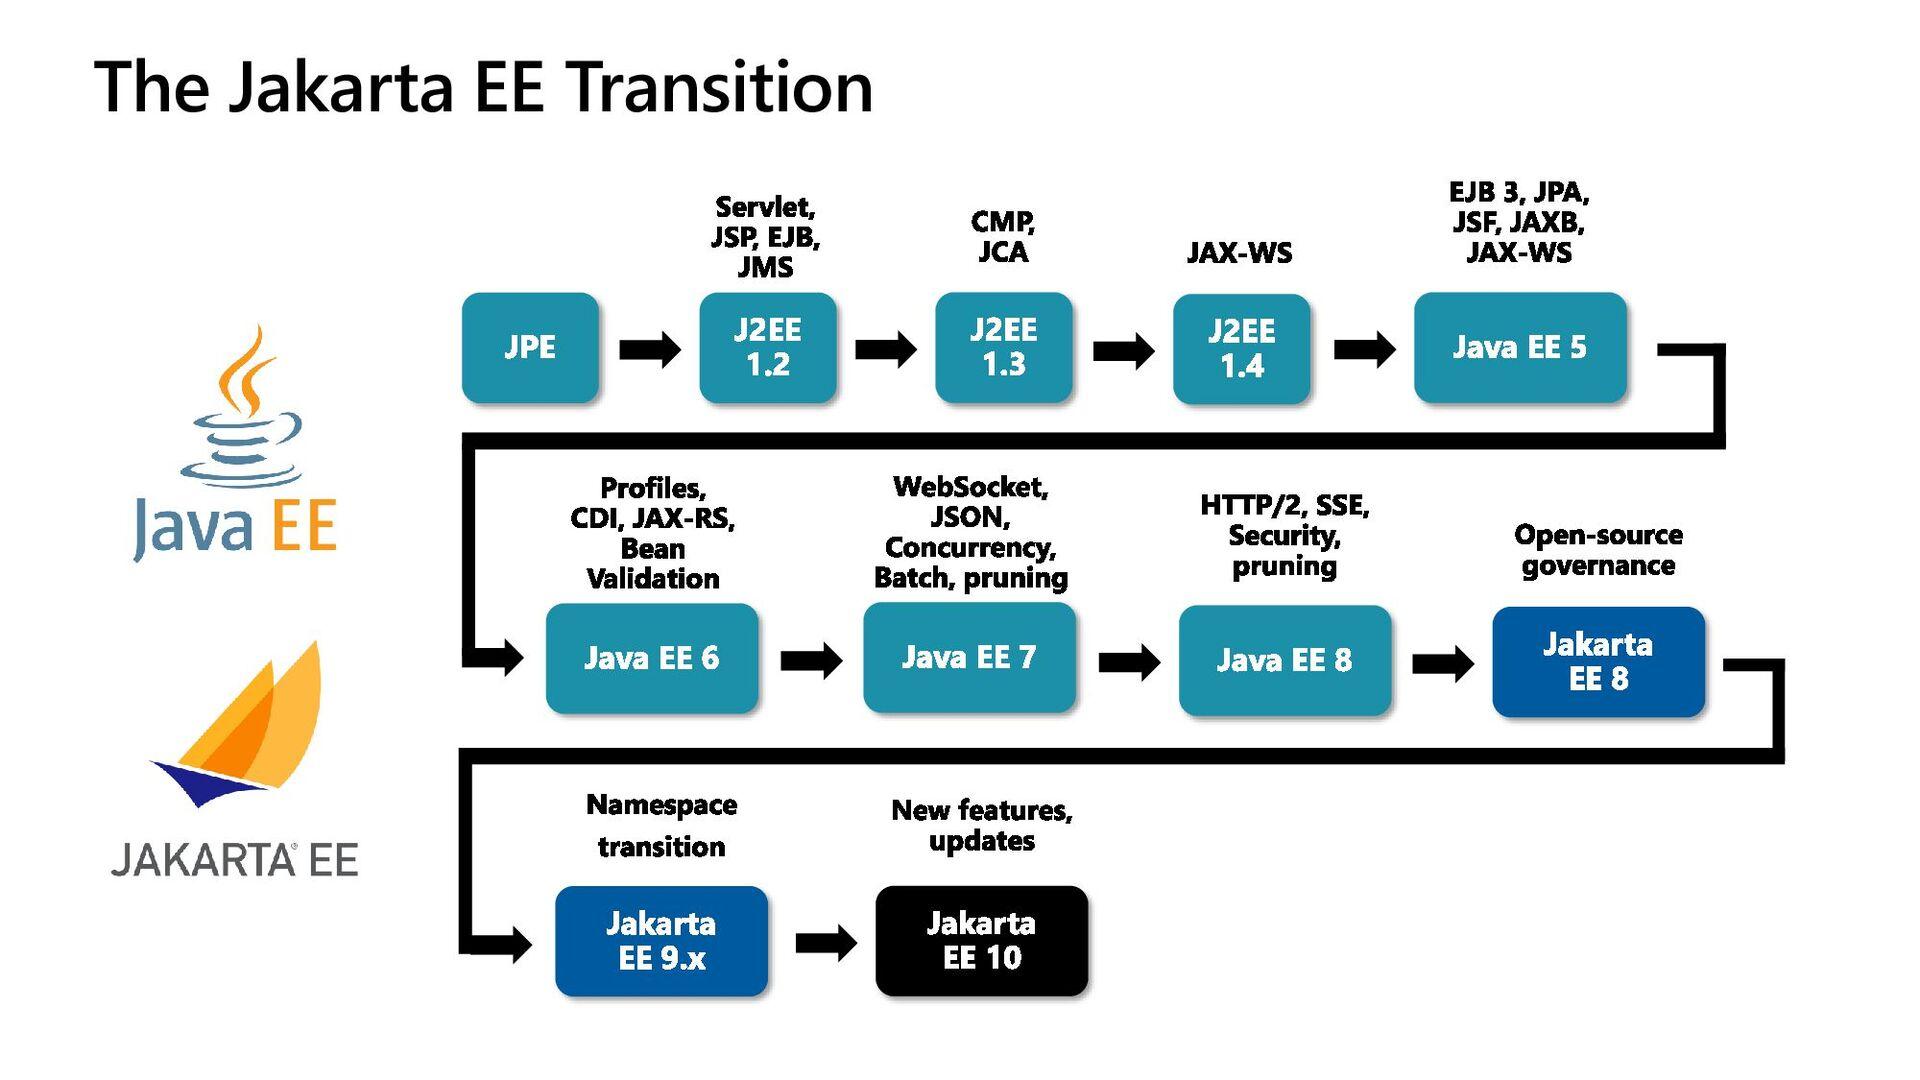 The Jakarta EE Transition